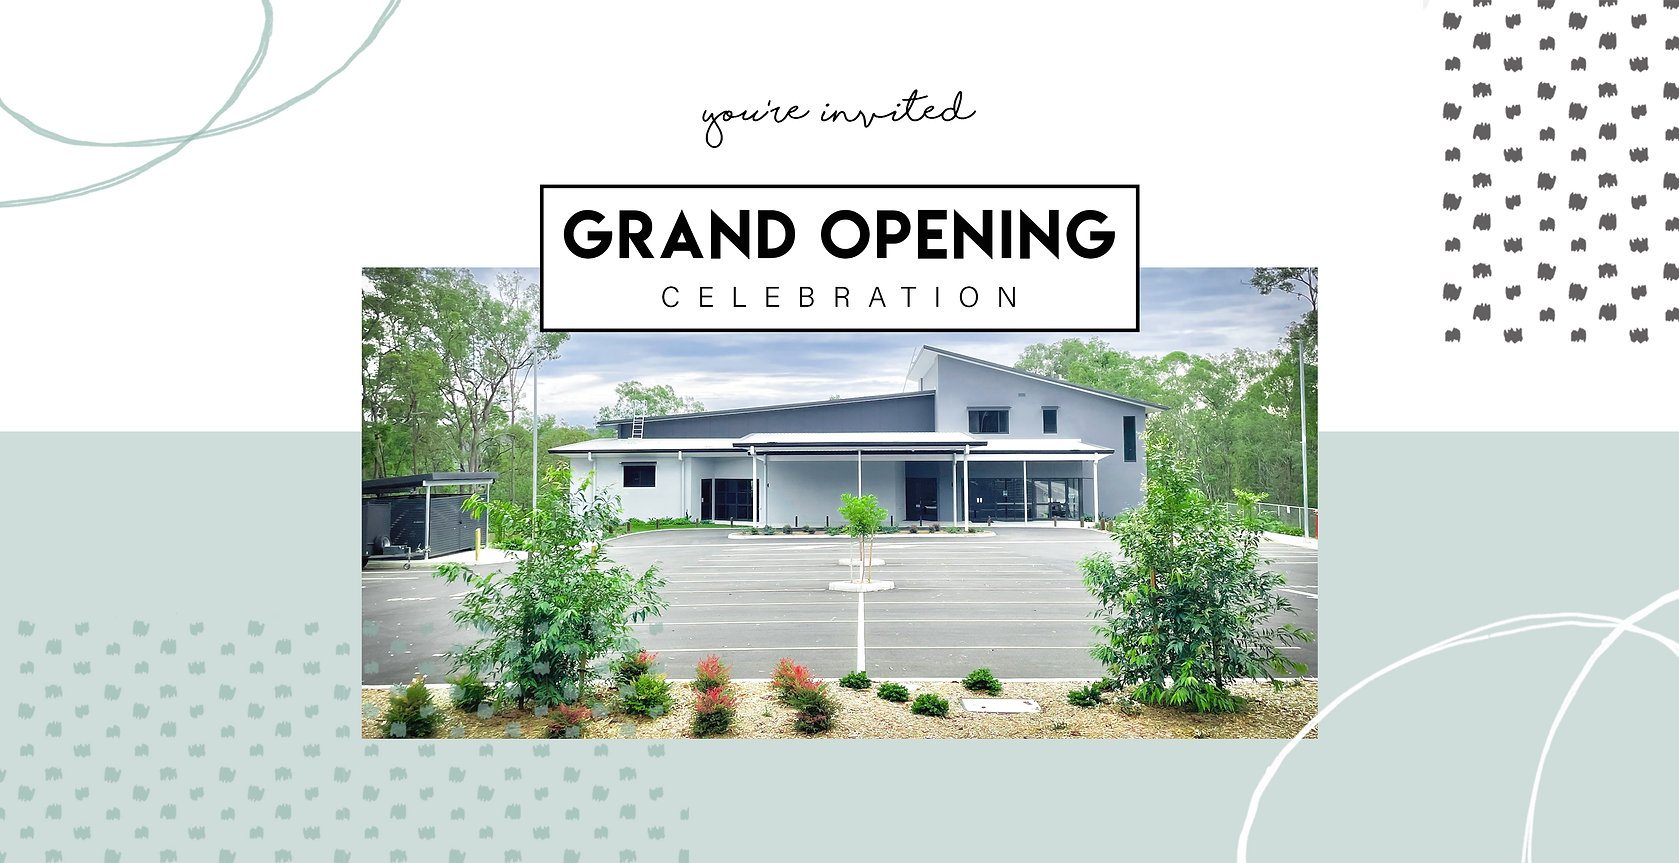 Grand Opening website 3.jpg